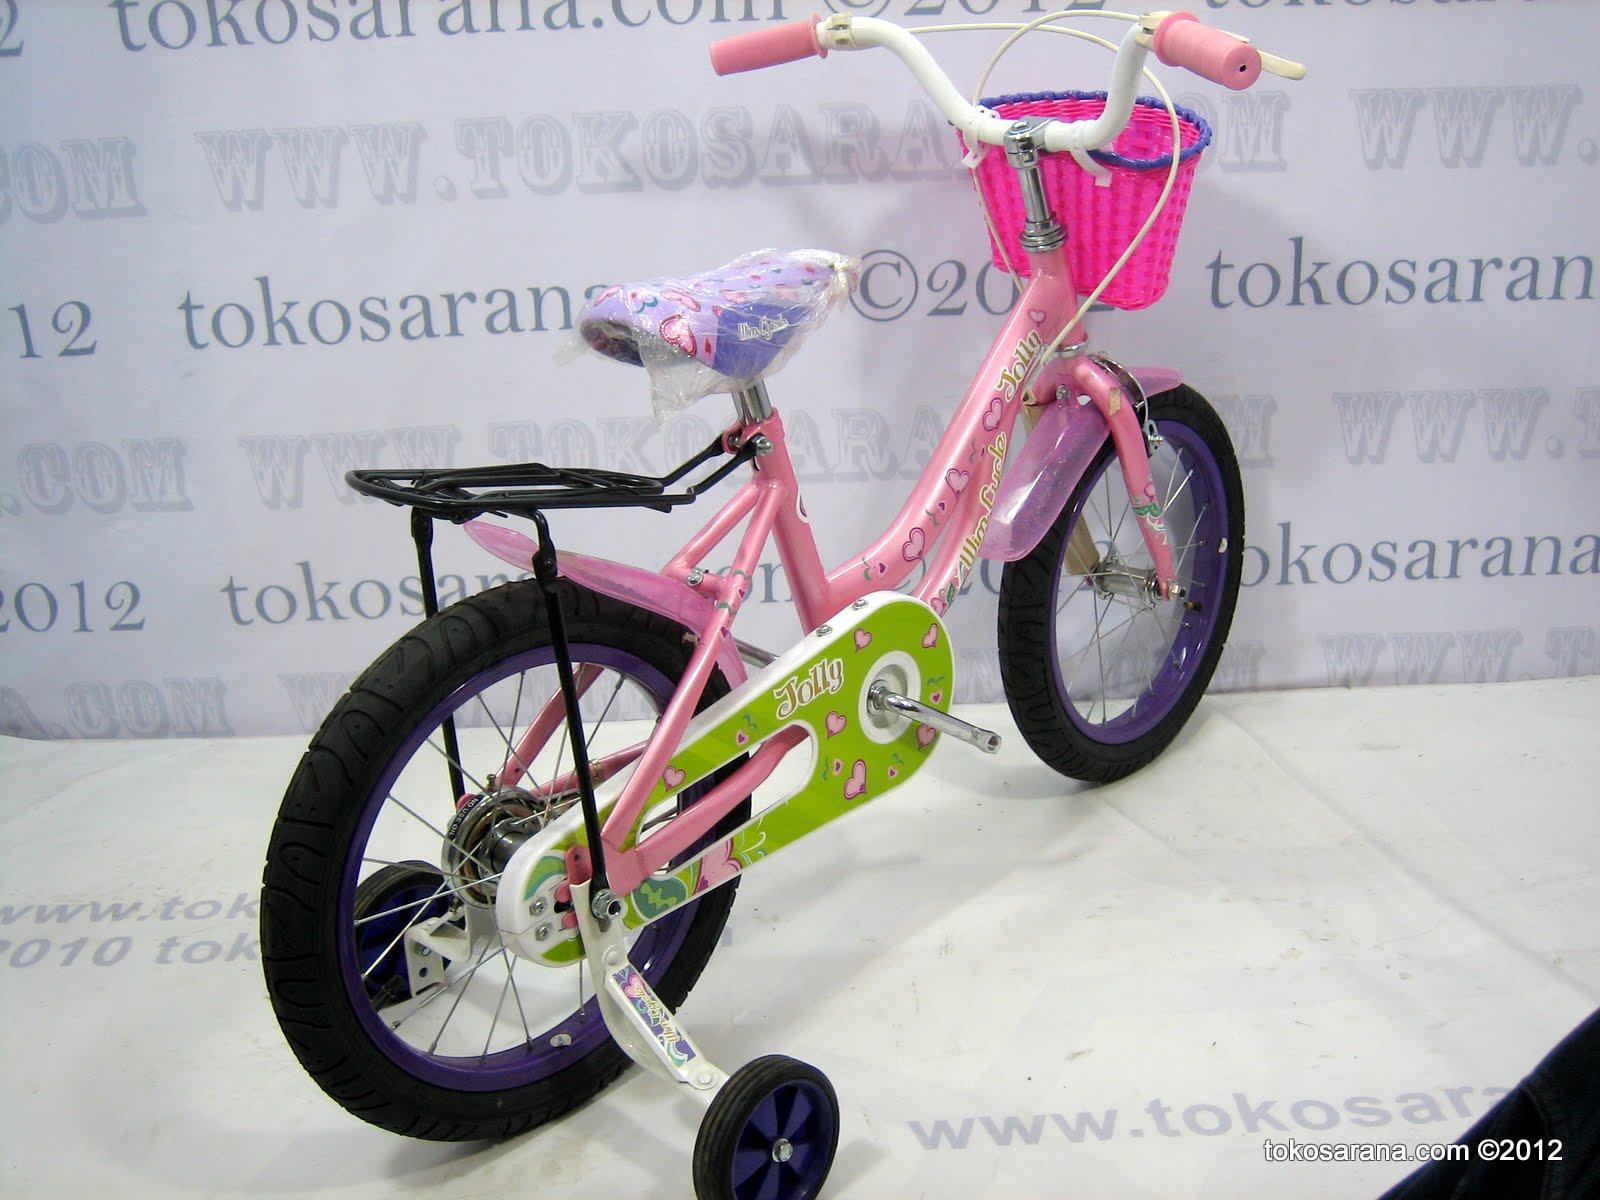 http://2.bp.blogspot.com/-yyP2M9QZfWE/T2LuaW-nfoI/AAAAAAAAPyY/inZ9Obg329U/s1600/16+wimcycle+jolly+special+edition+%25282%2529.JPG